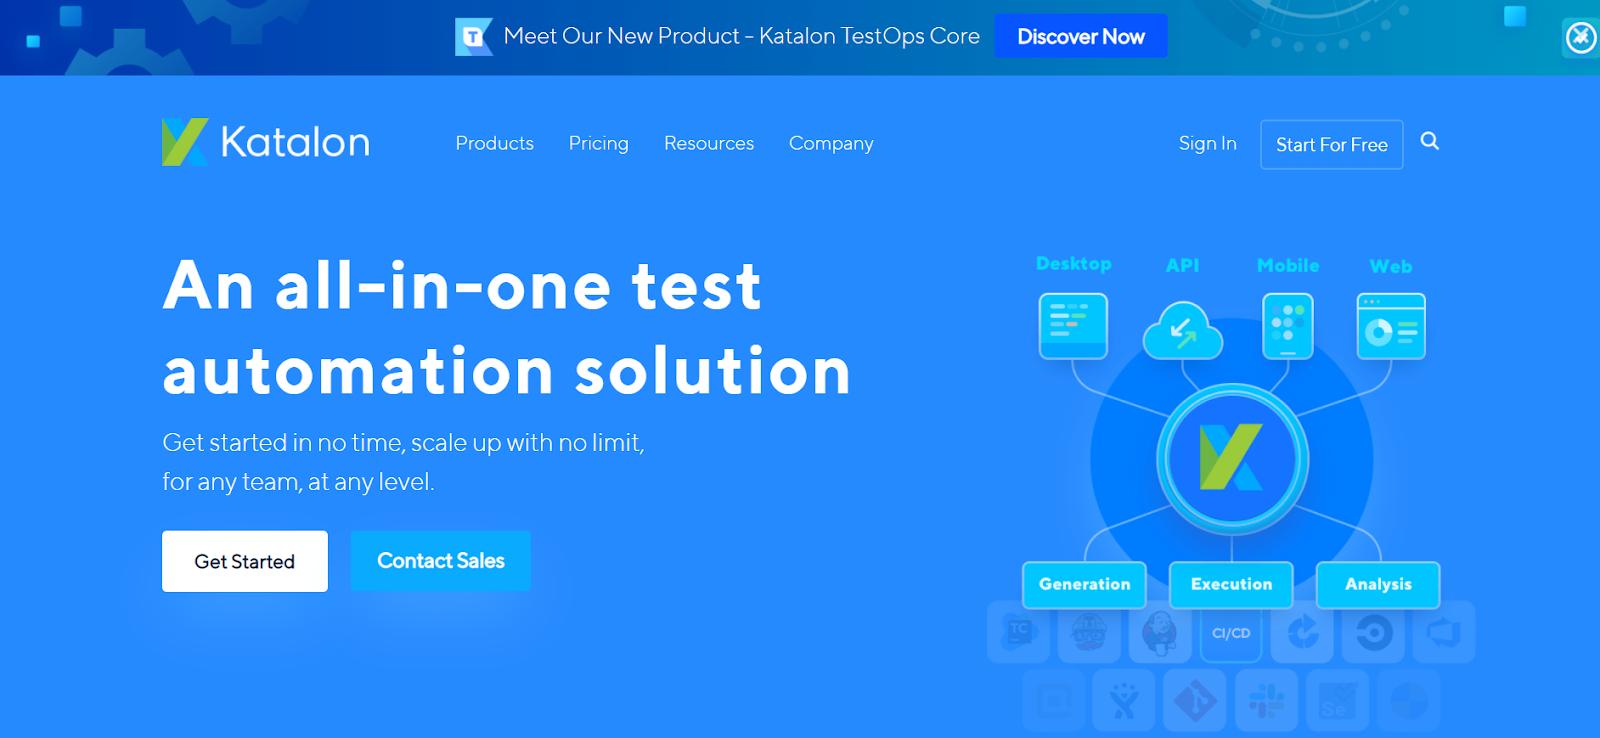 Katalon Automation Testing Tool